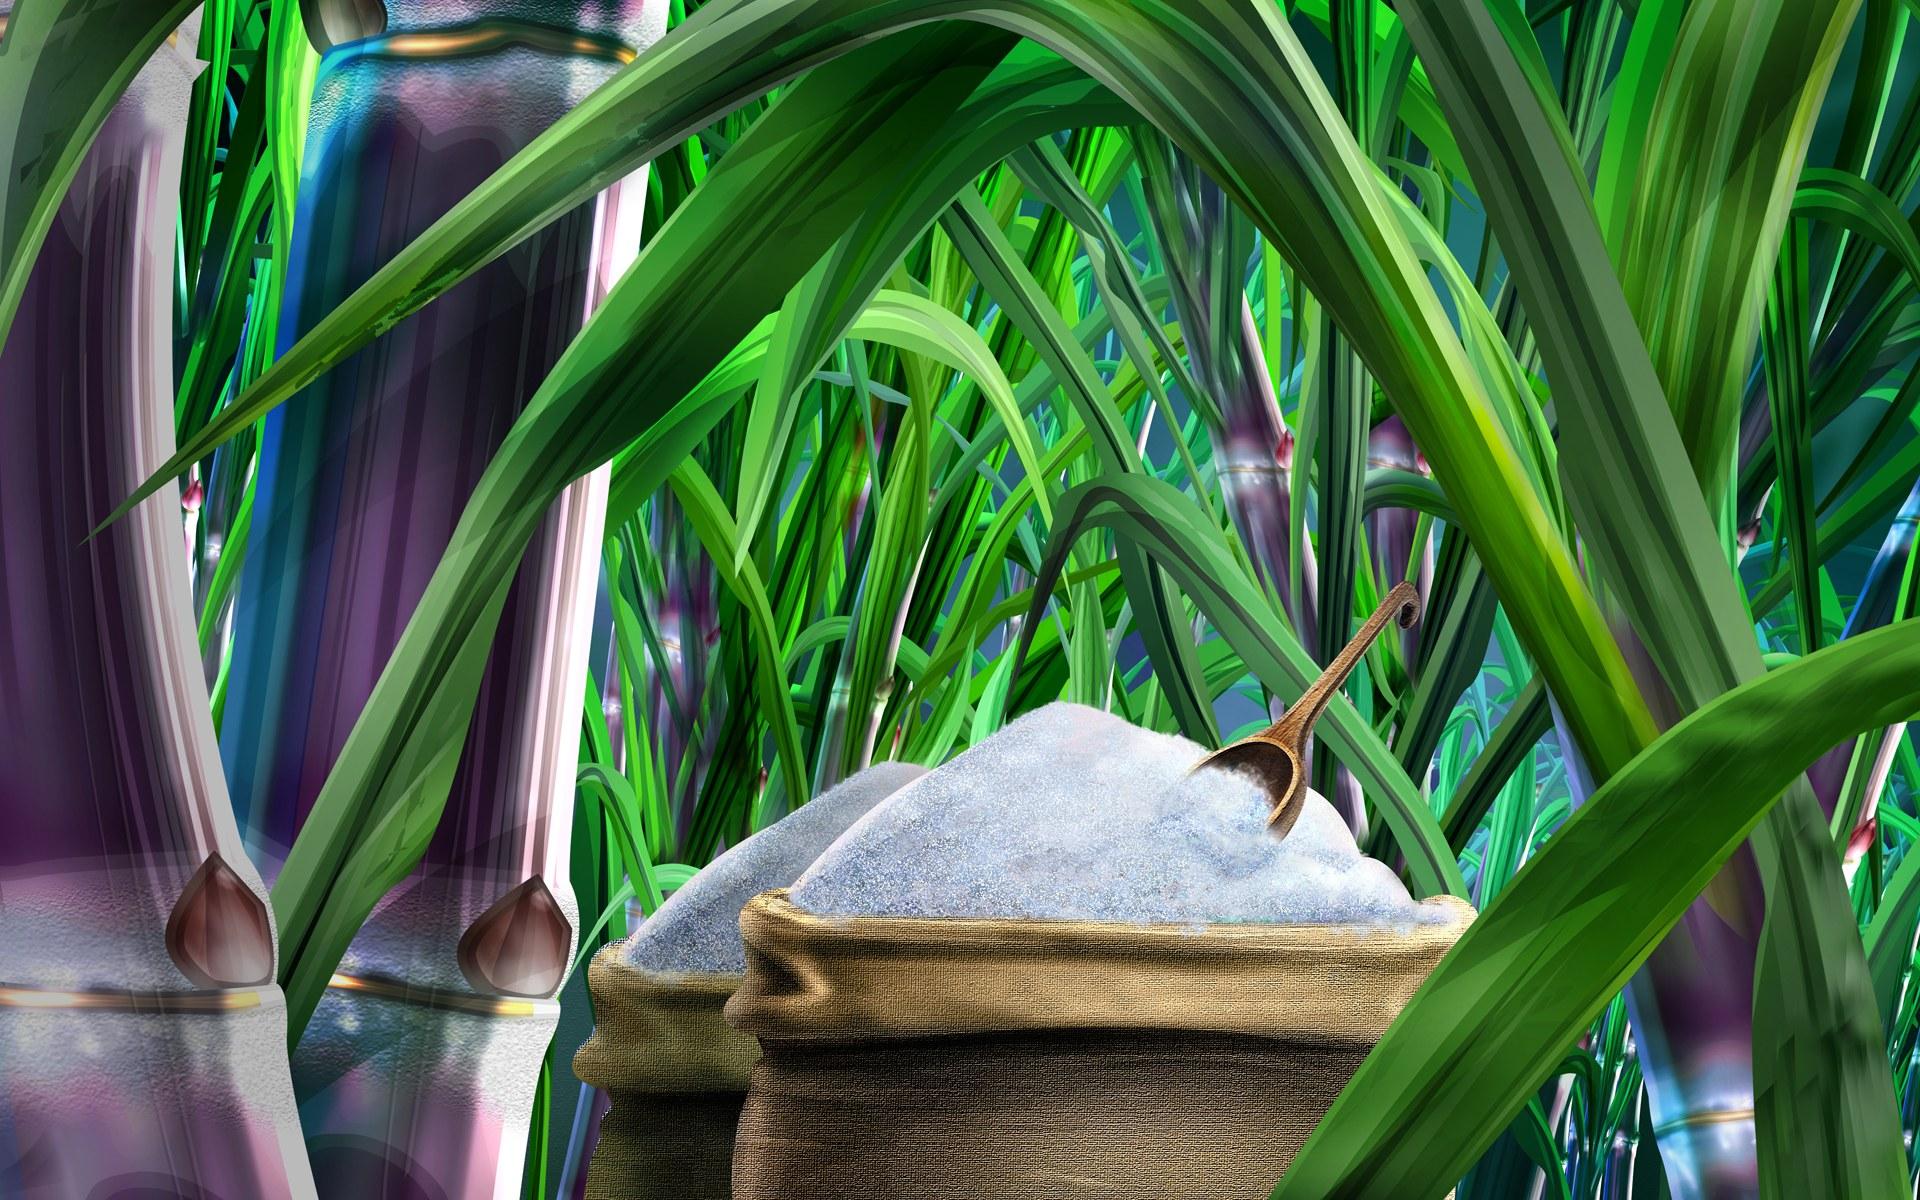 PSD Food illustrations 3127 sugar and sugarcane picturejpg 1920x1200